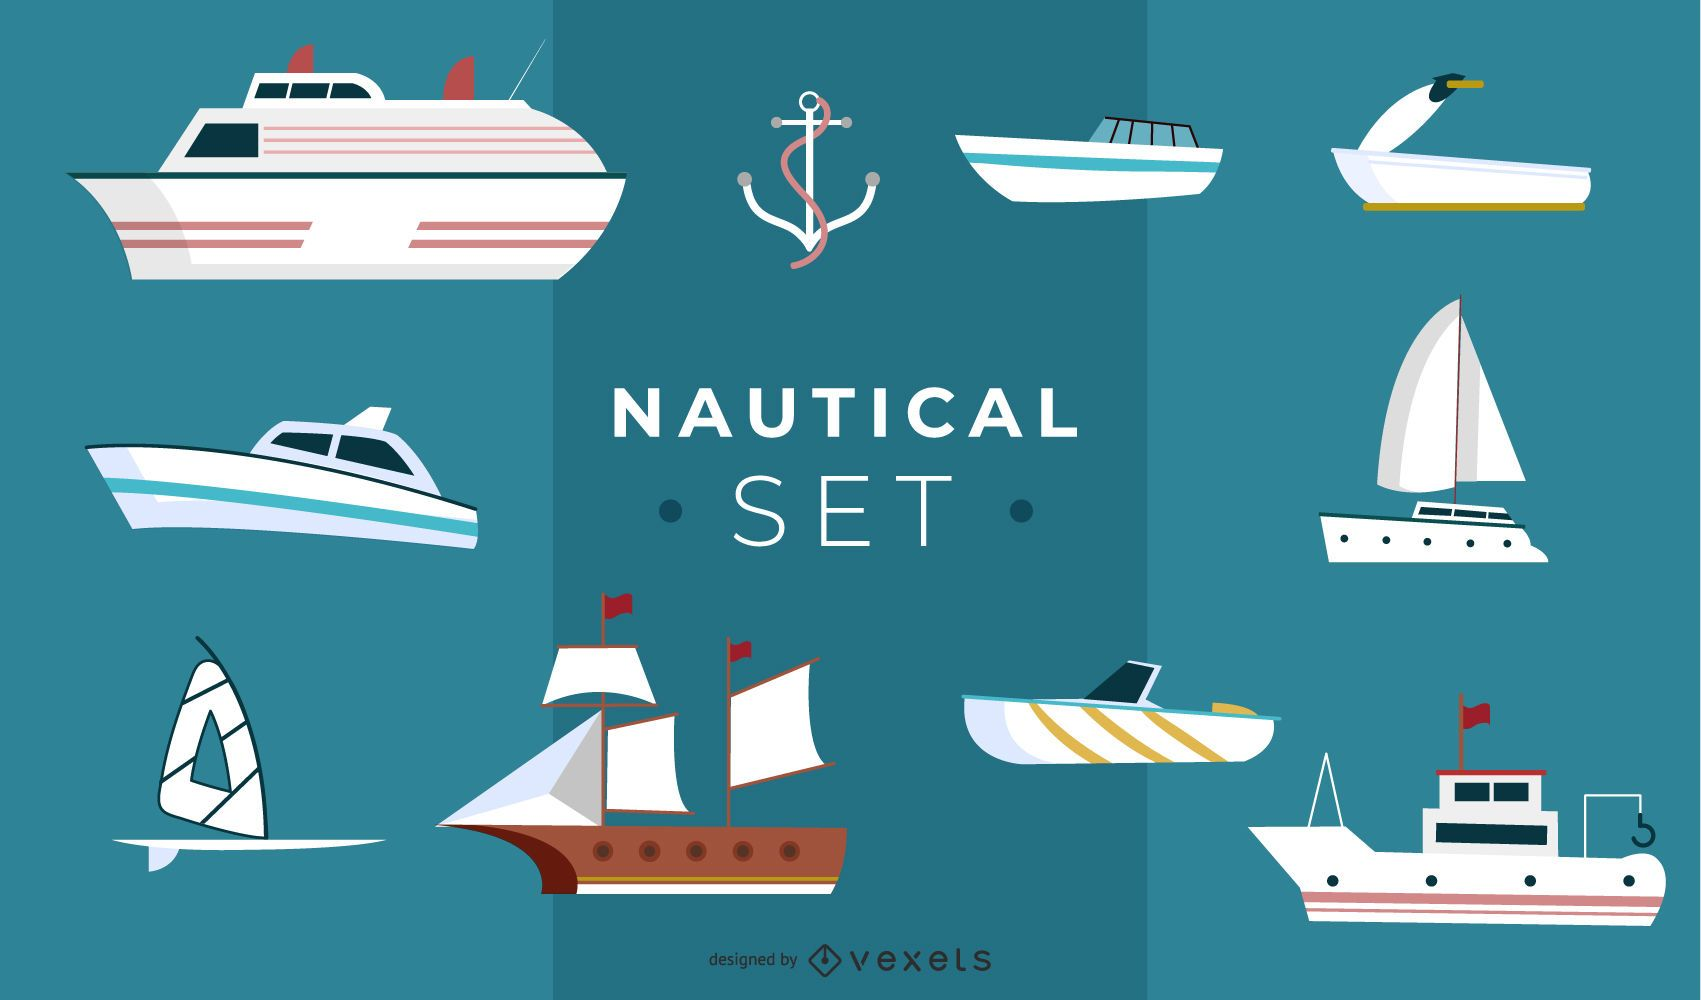 Nautical Illustration Set Design